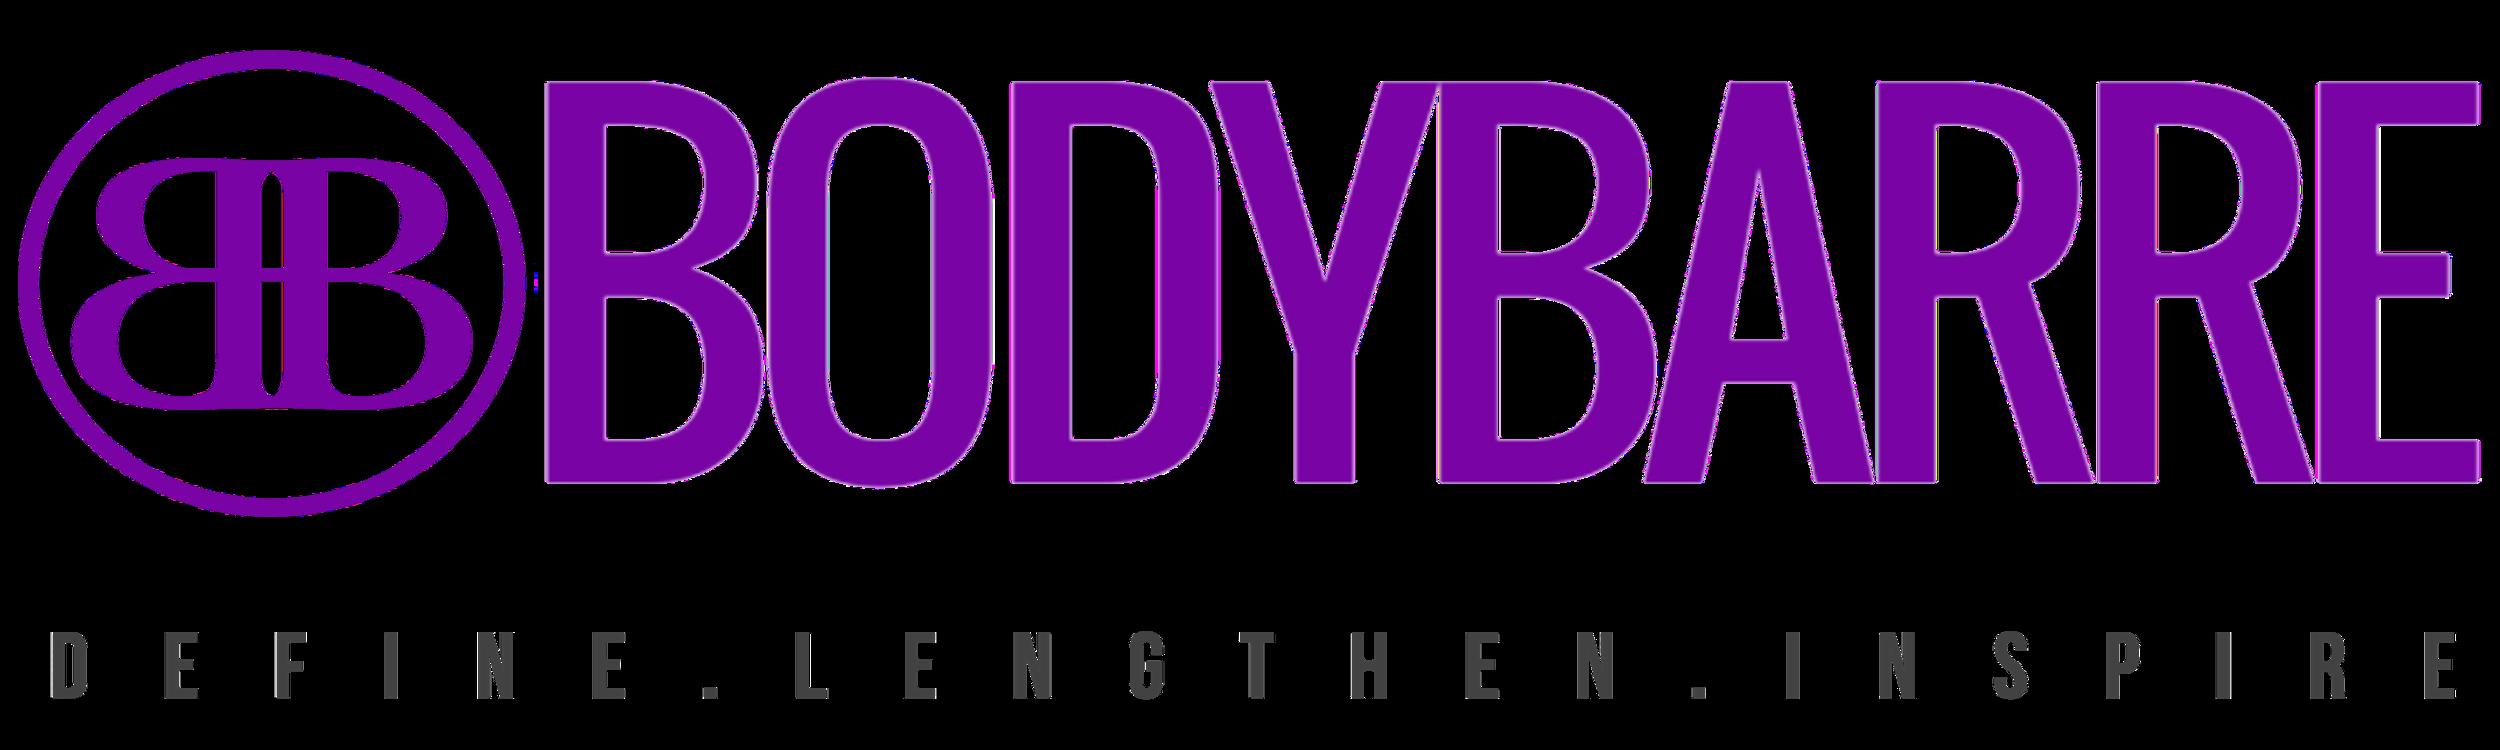 BodyBarre Full Logo 2019